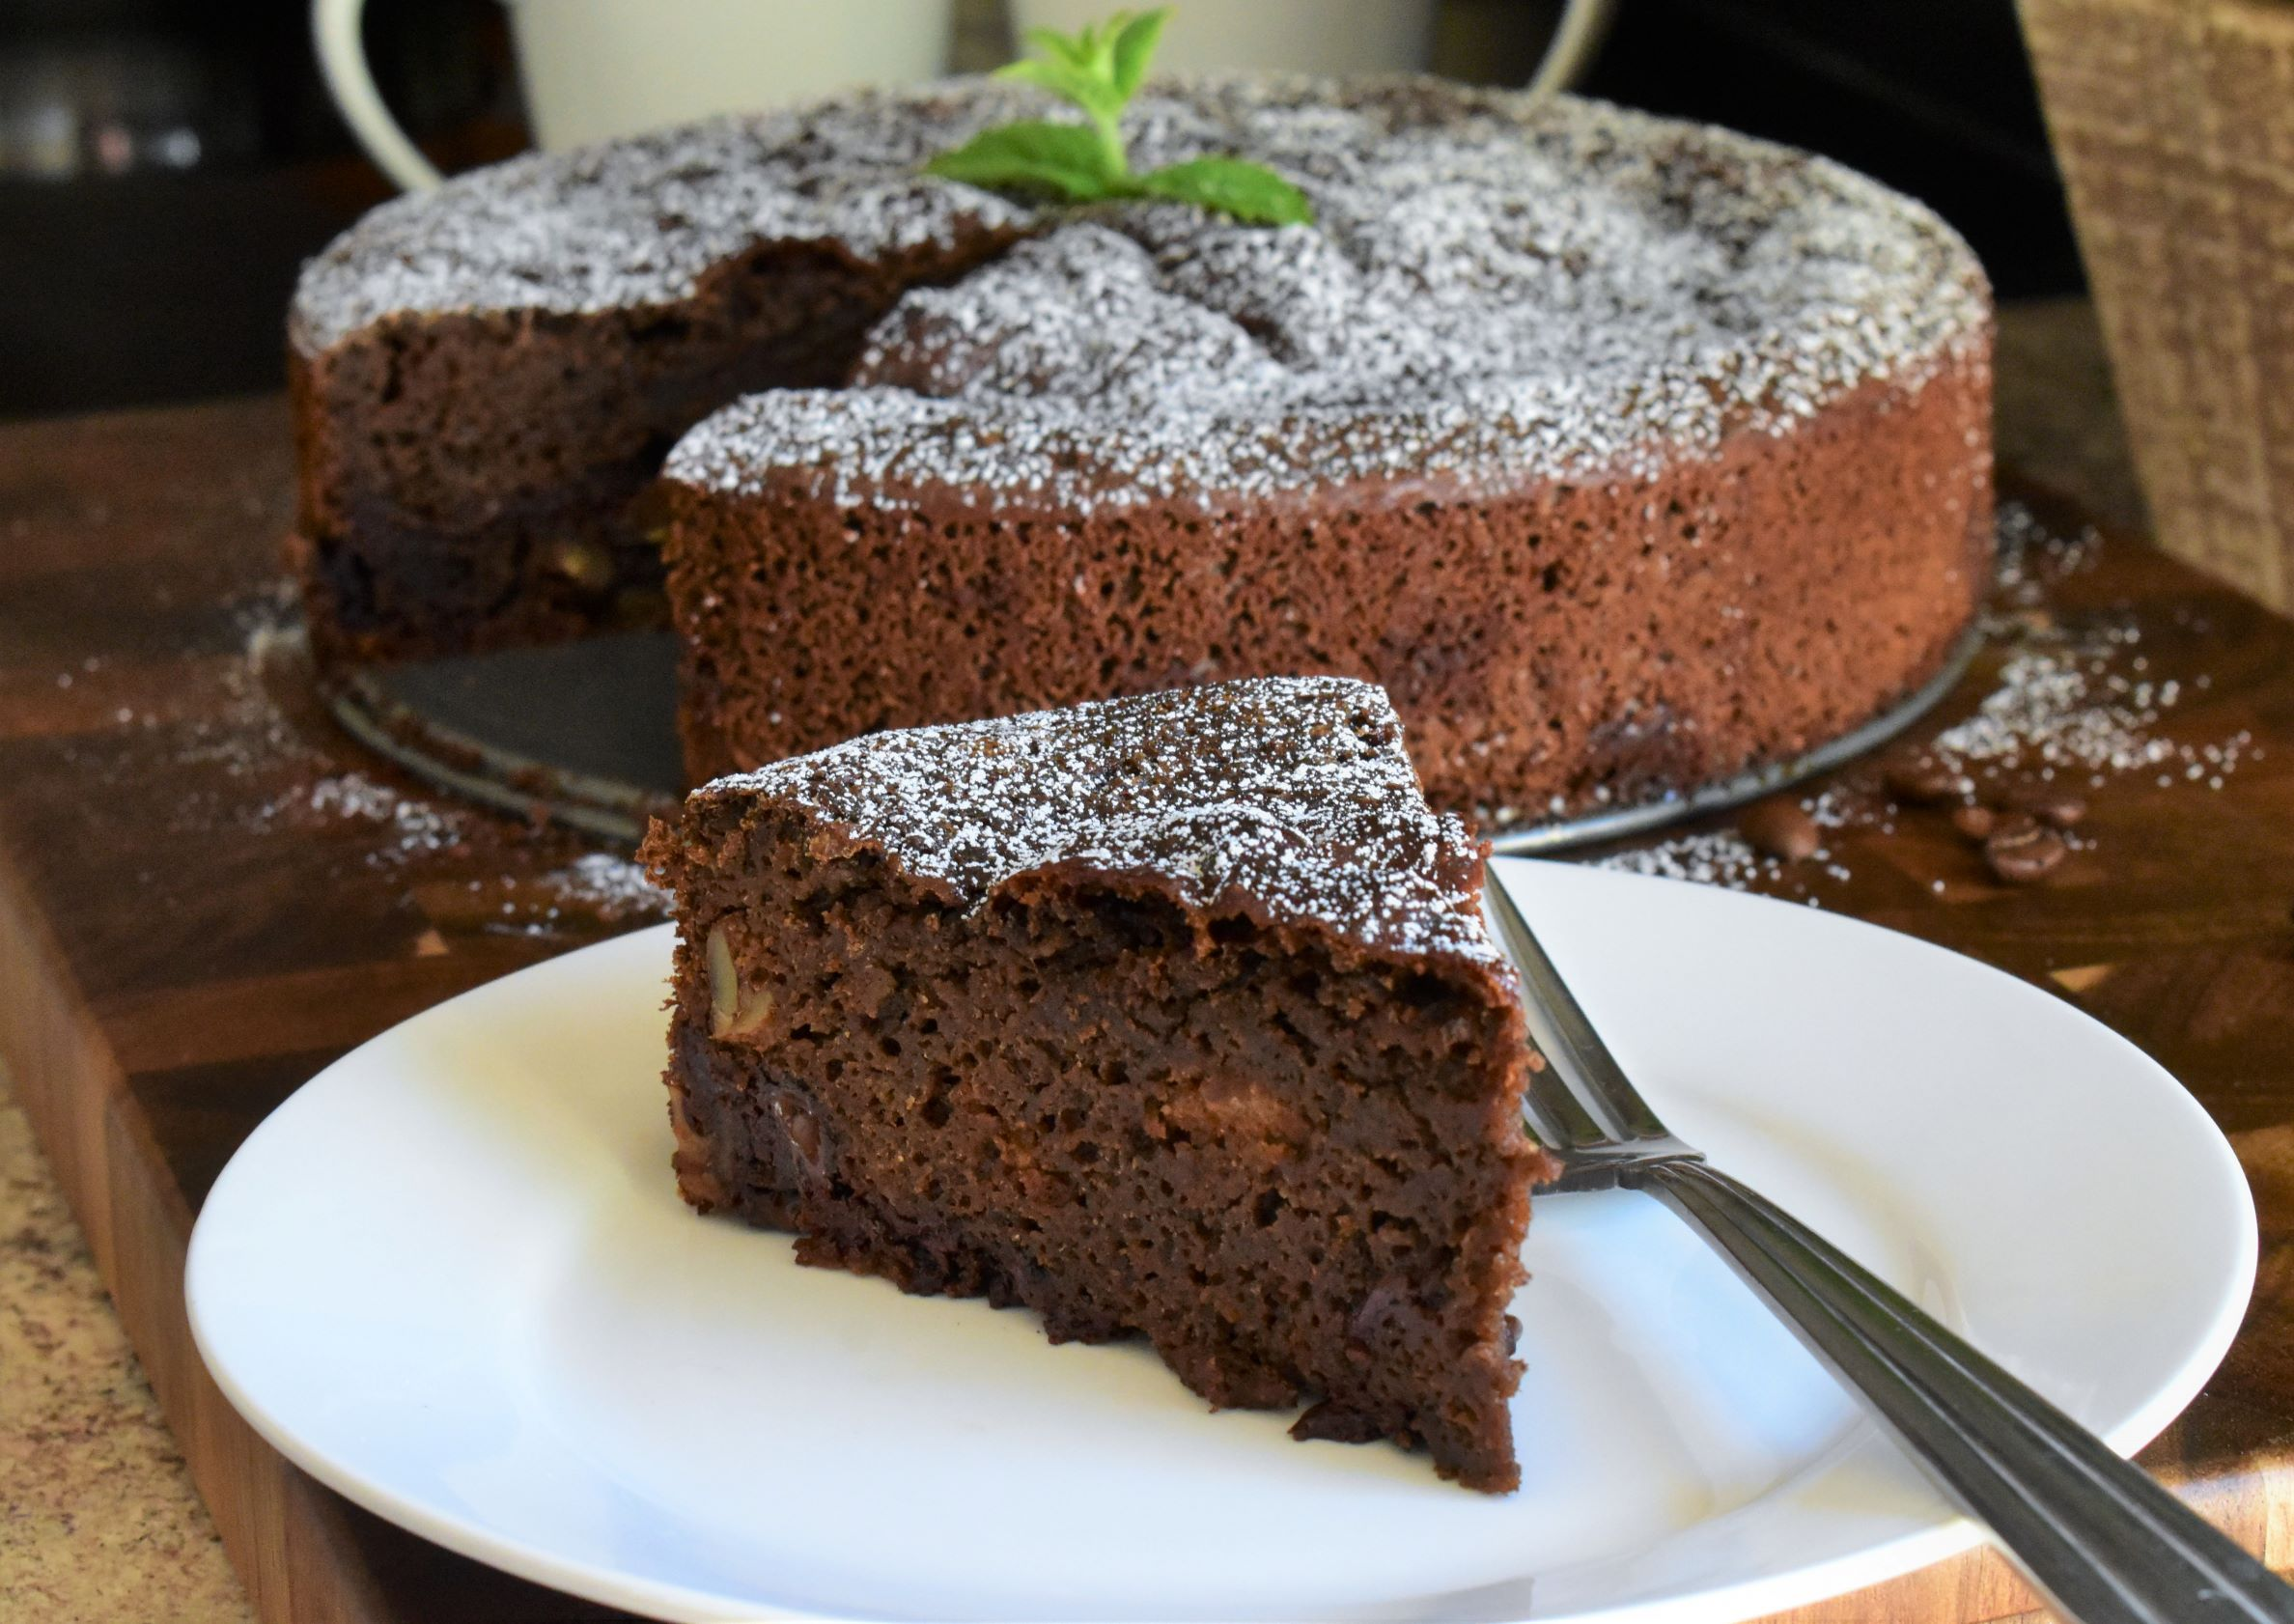 Whole Wheat Chocolate-Coffee Cake